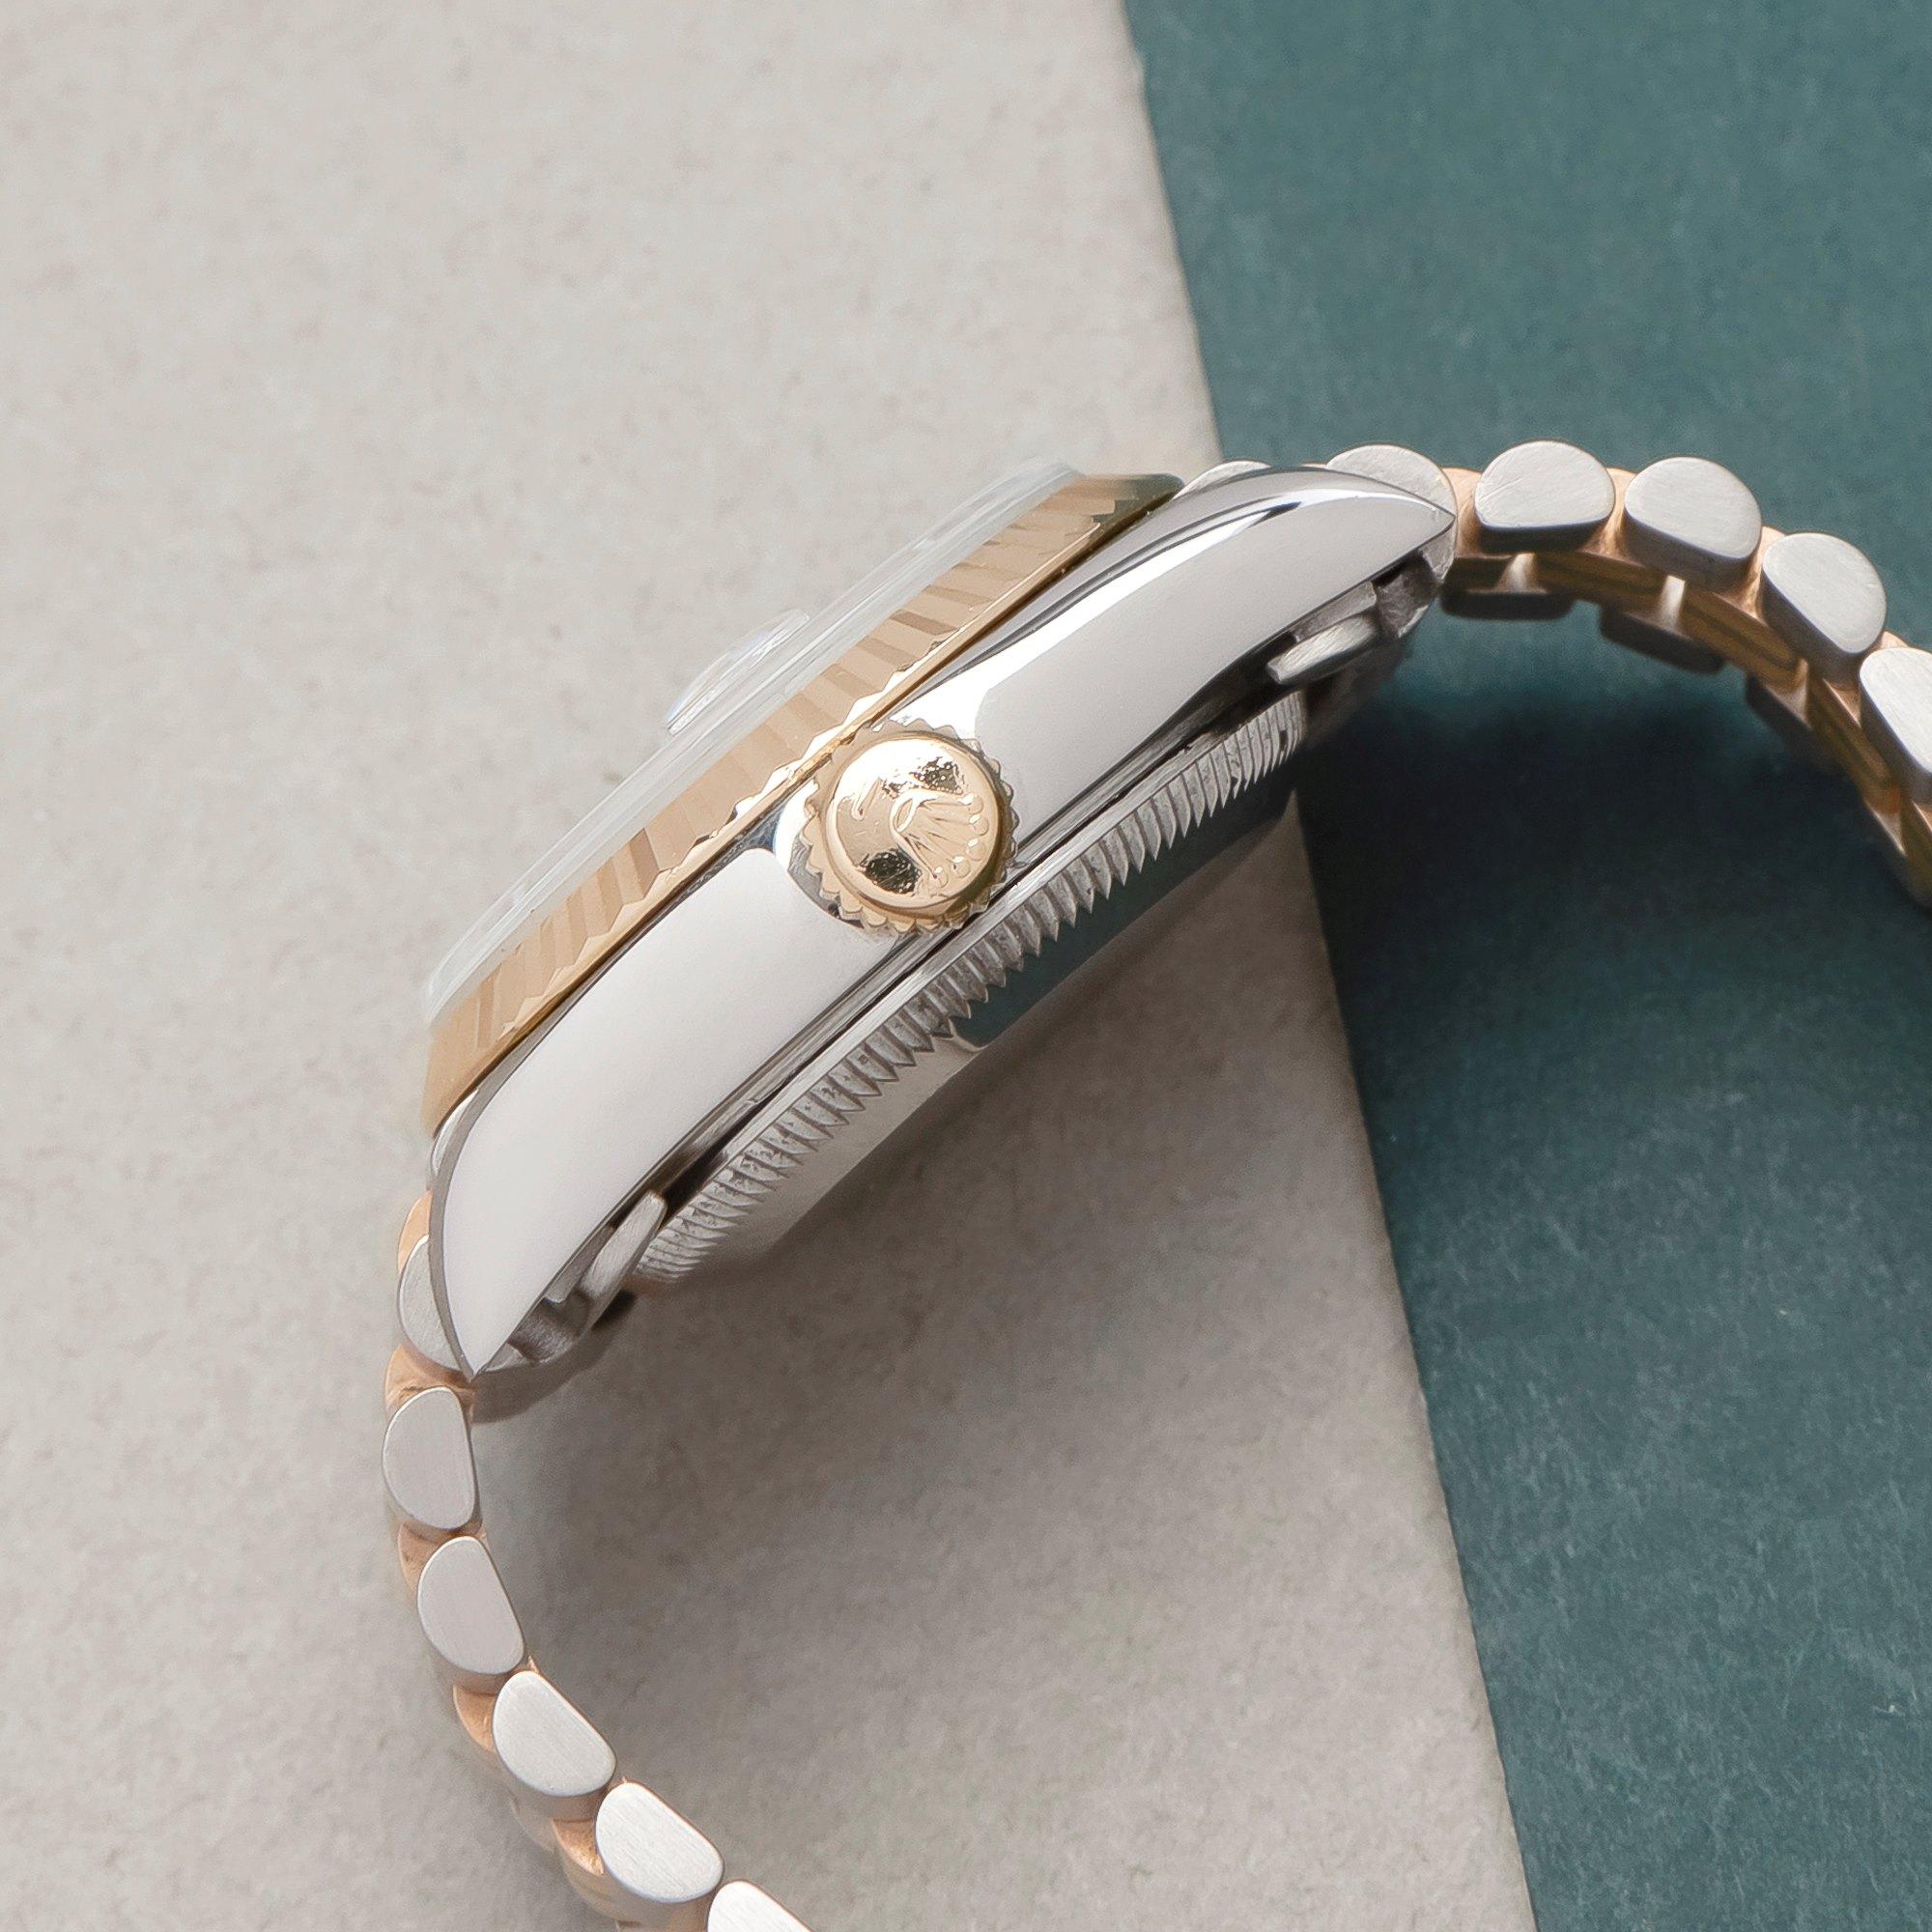 Rolex Datejust 26 'Tridor' 18K Yellow Gold & Stainless Steel 69179